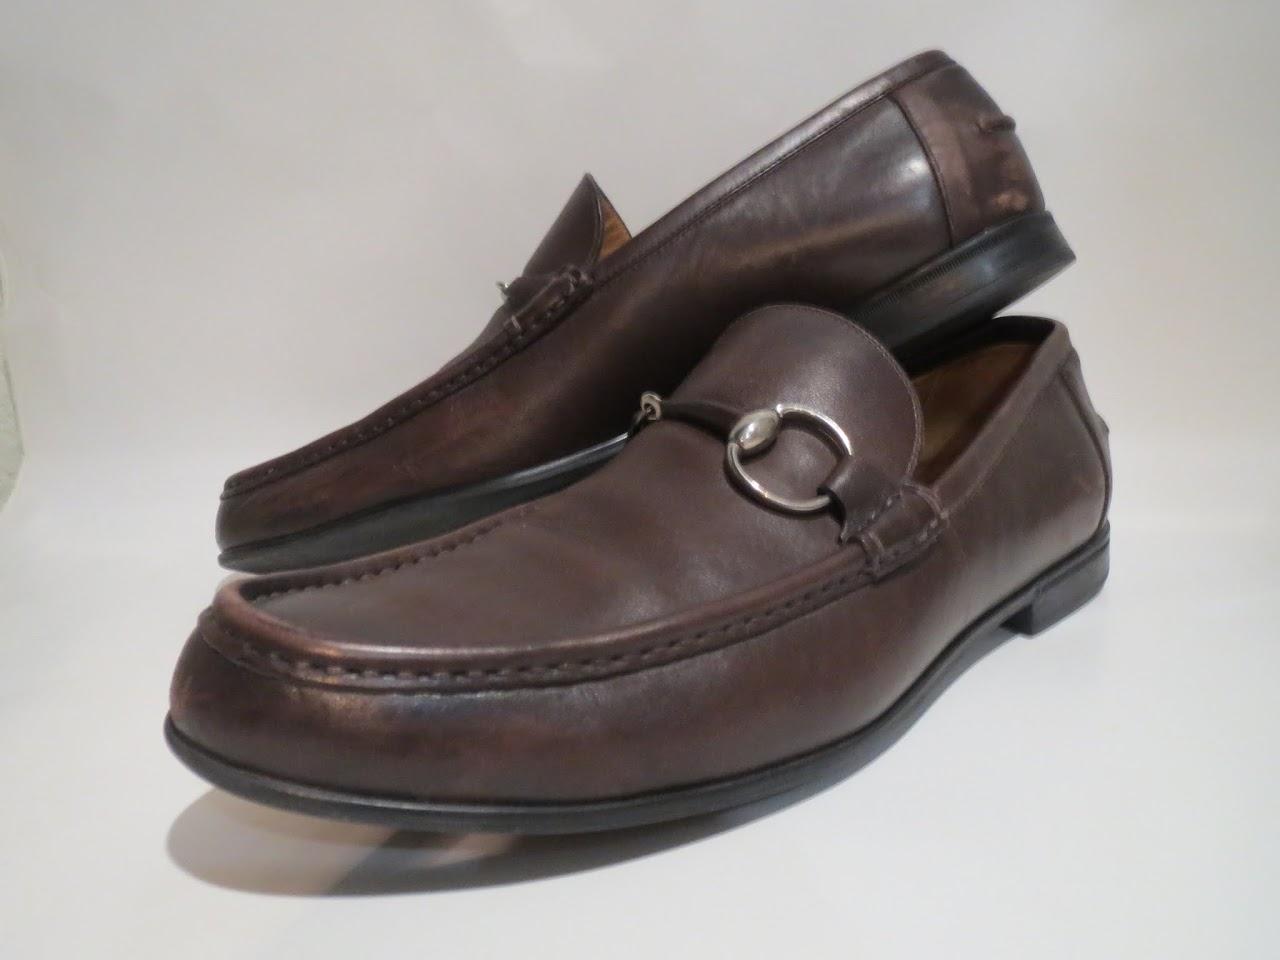 Gucci Mocha Loafers